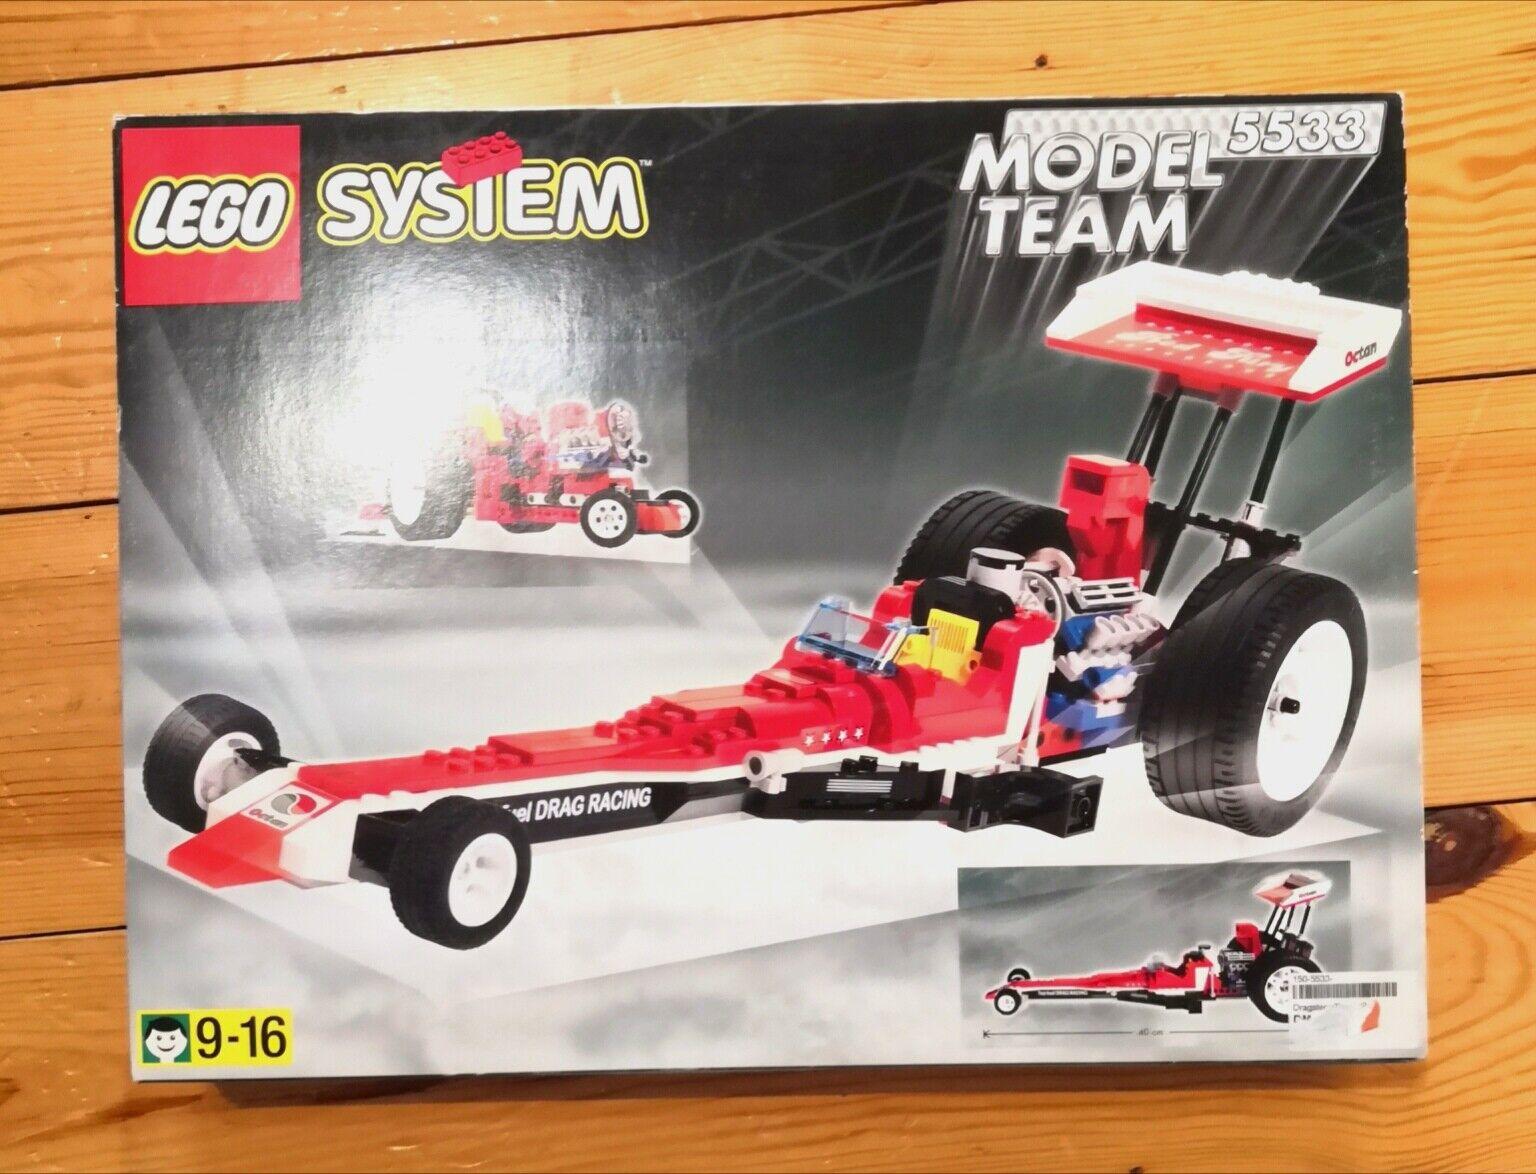 Lego System 5533 Model Team rot Fury NEU & OVP